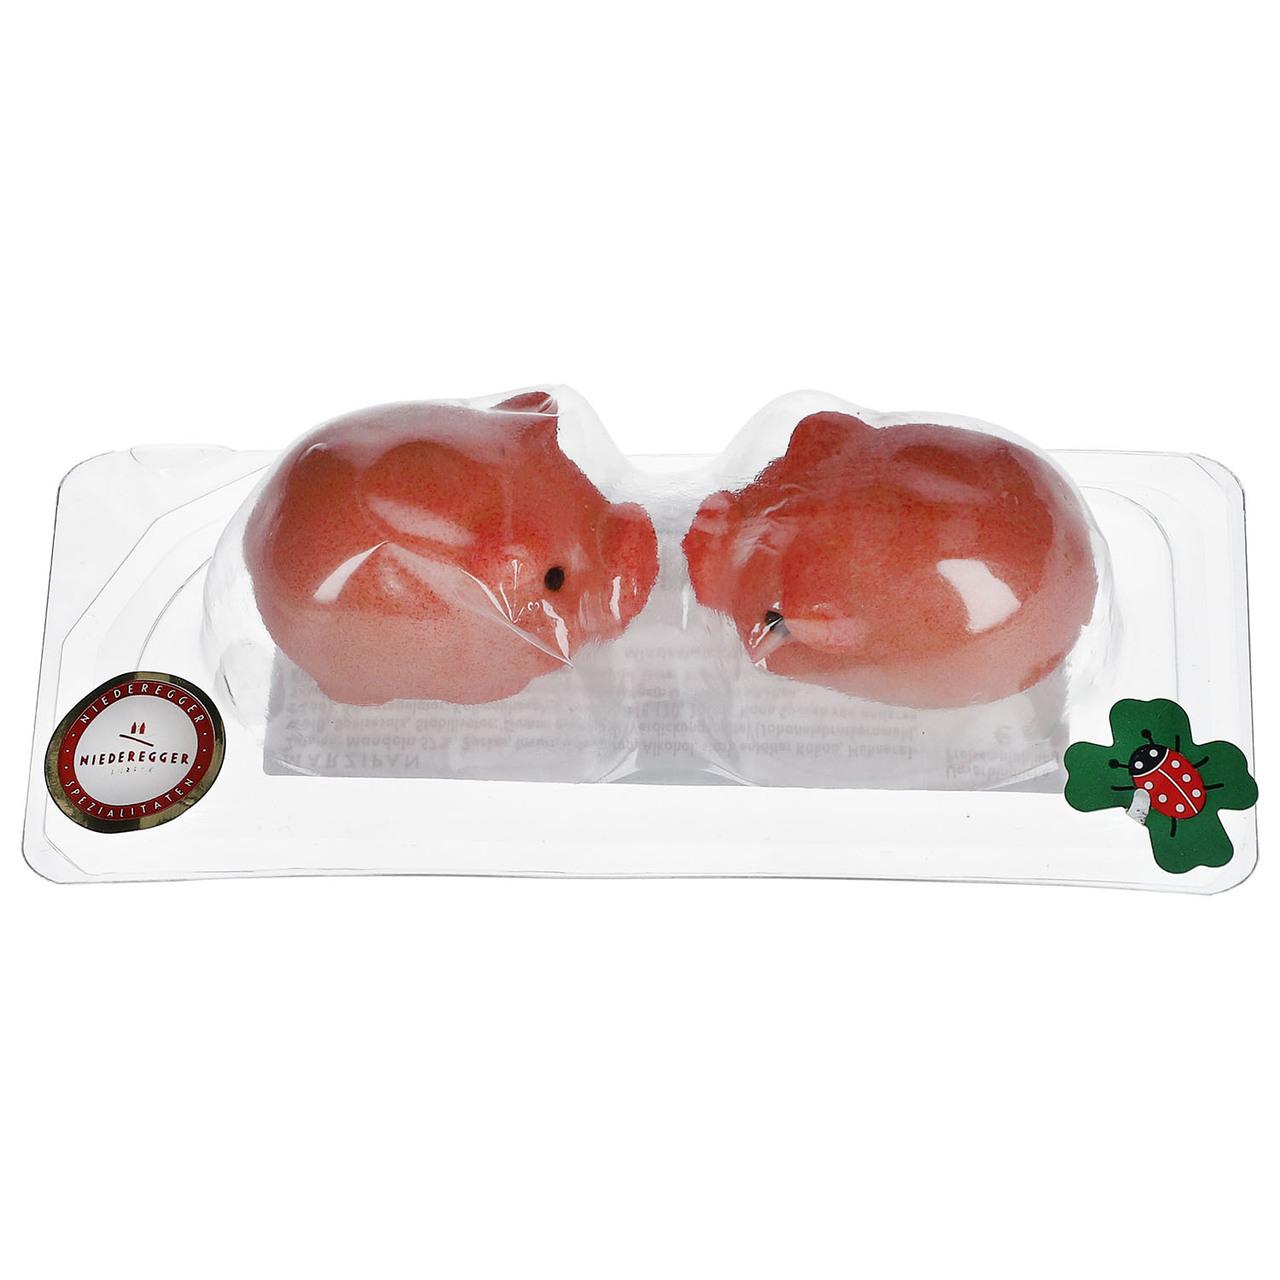 Niederegger Marzipan  Twin Pigs